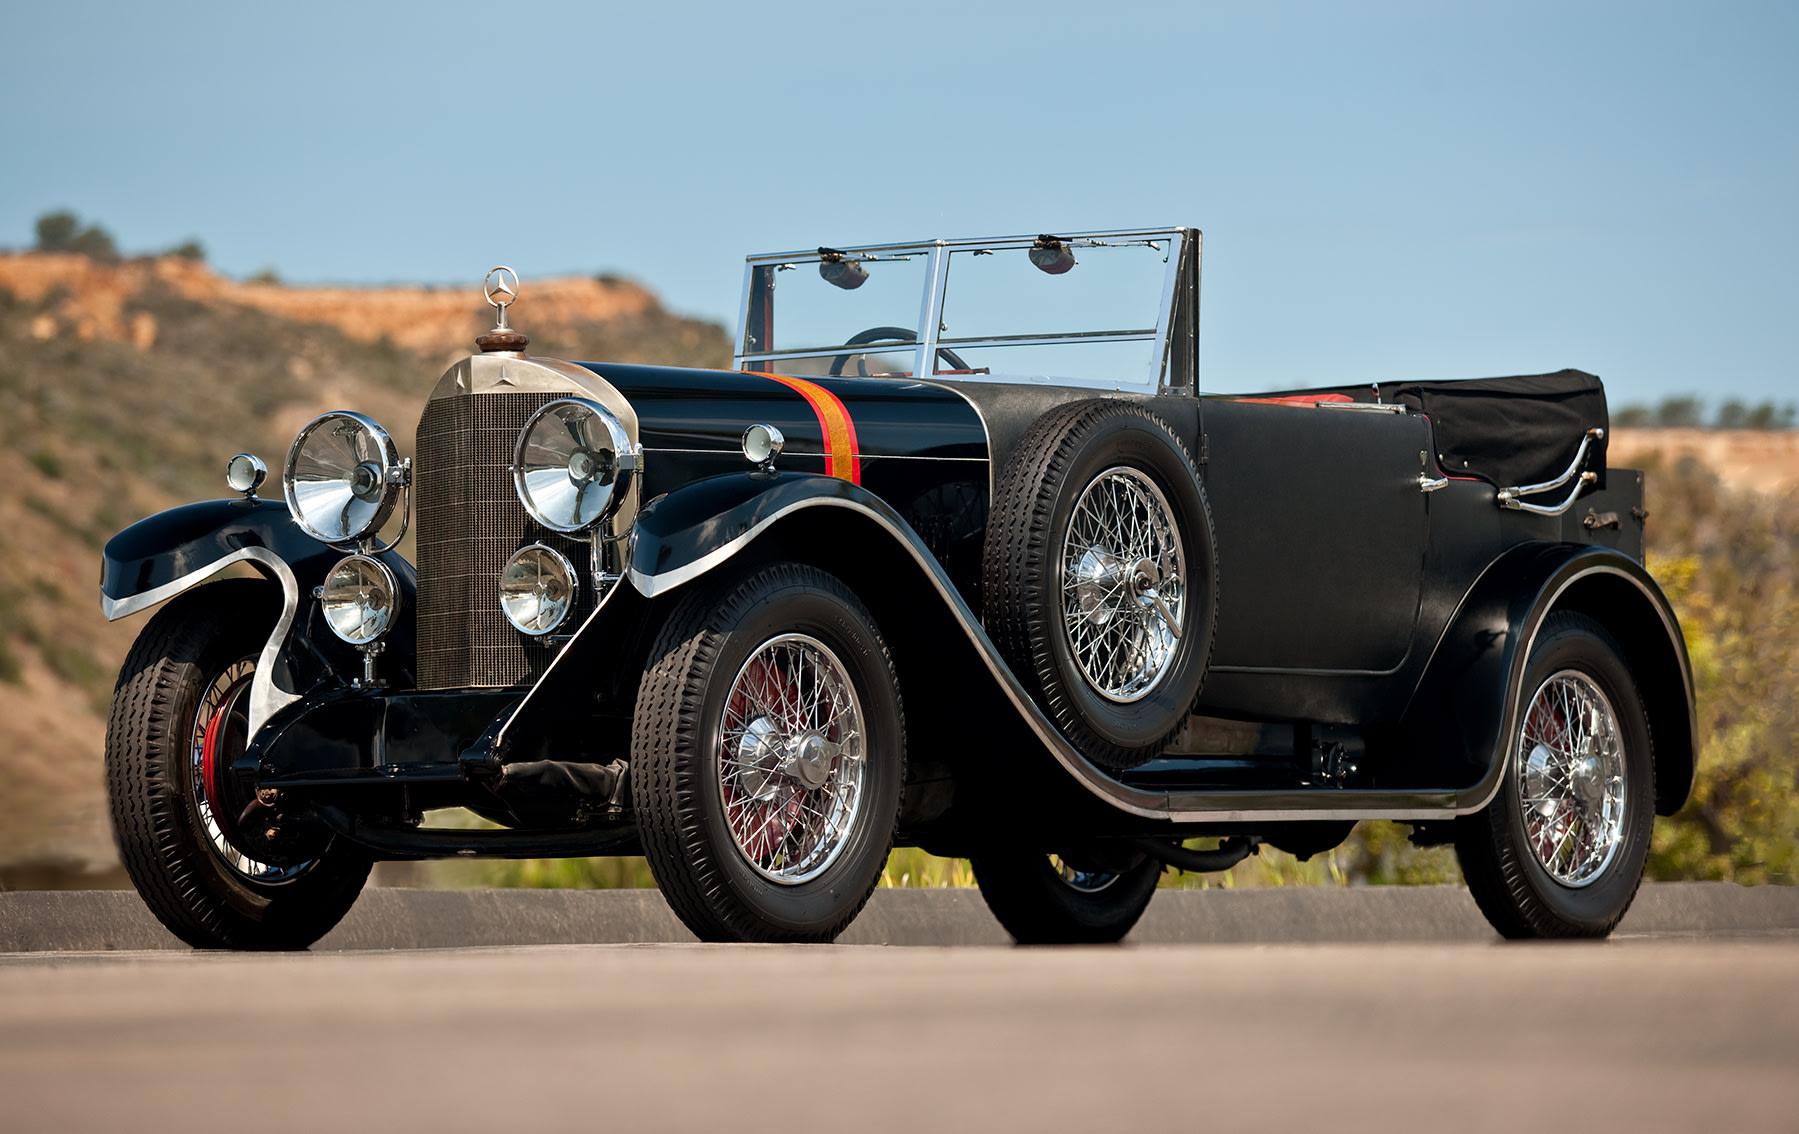 1927 Mercedes-Benz 630 Model K